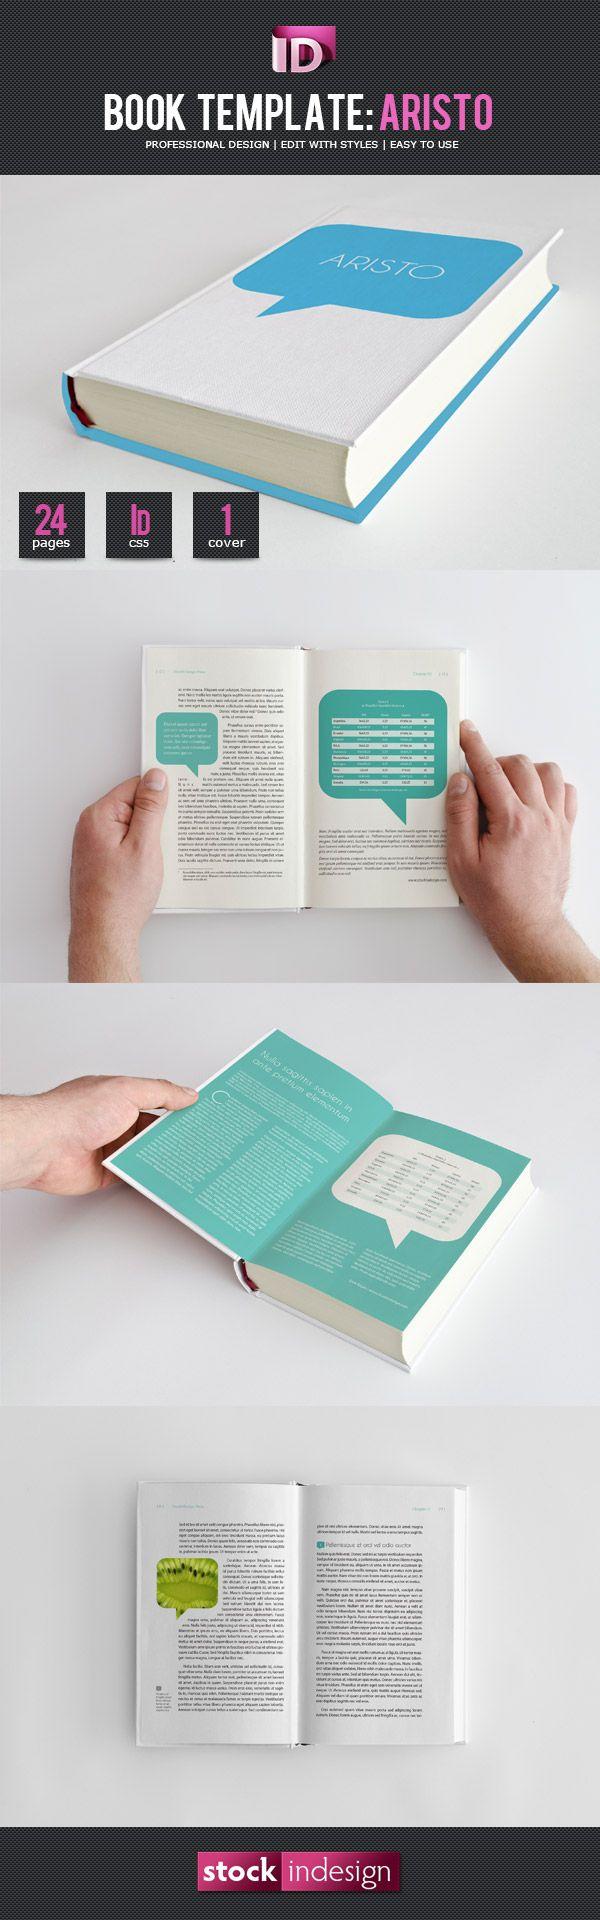 InDesign Libro Template | ARISTO gratis | mockups | Pinterest ...